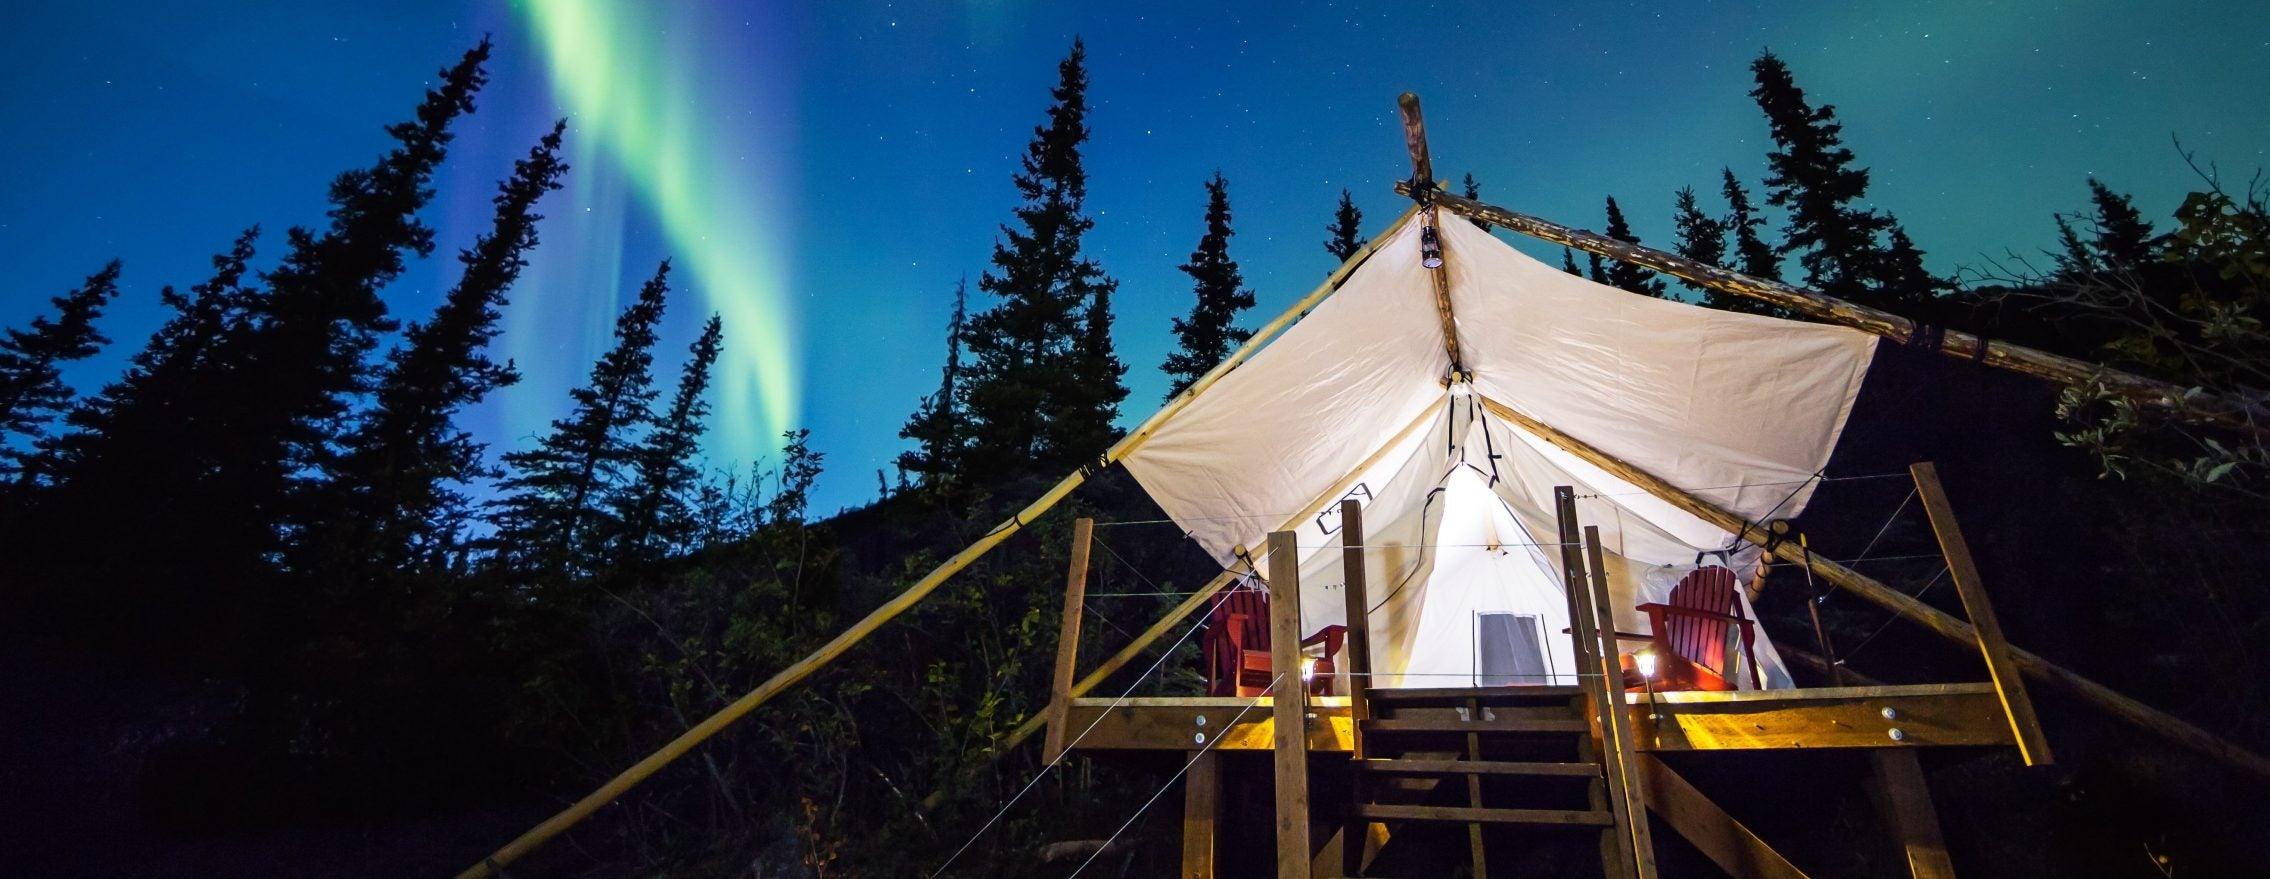 northern lights illuminate the sky above an eco-resort